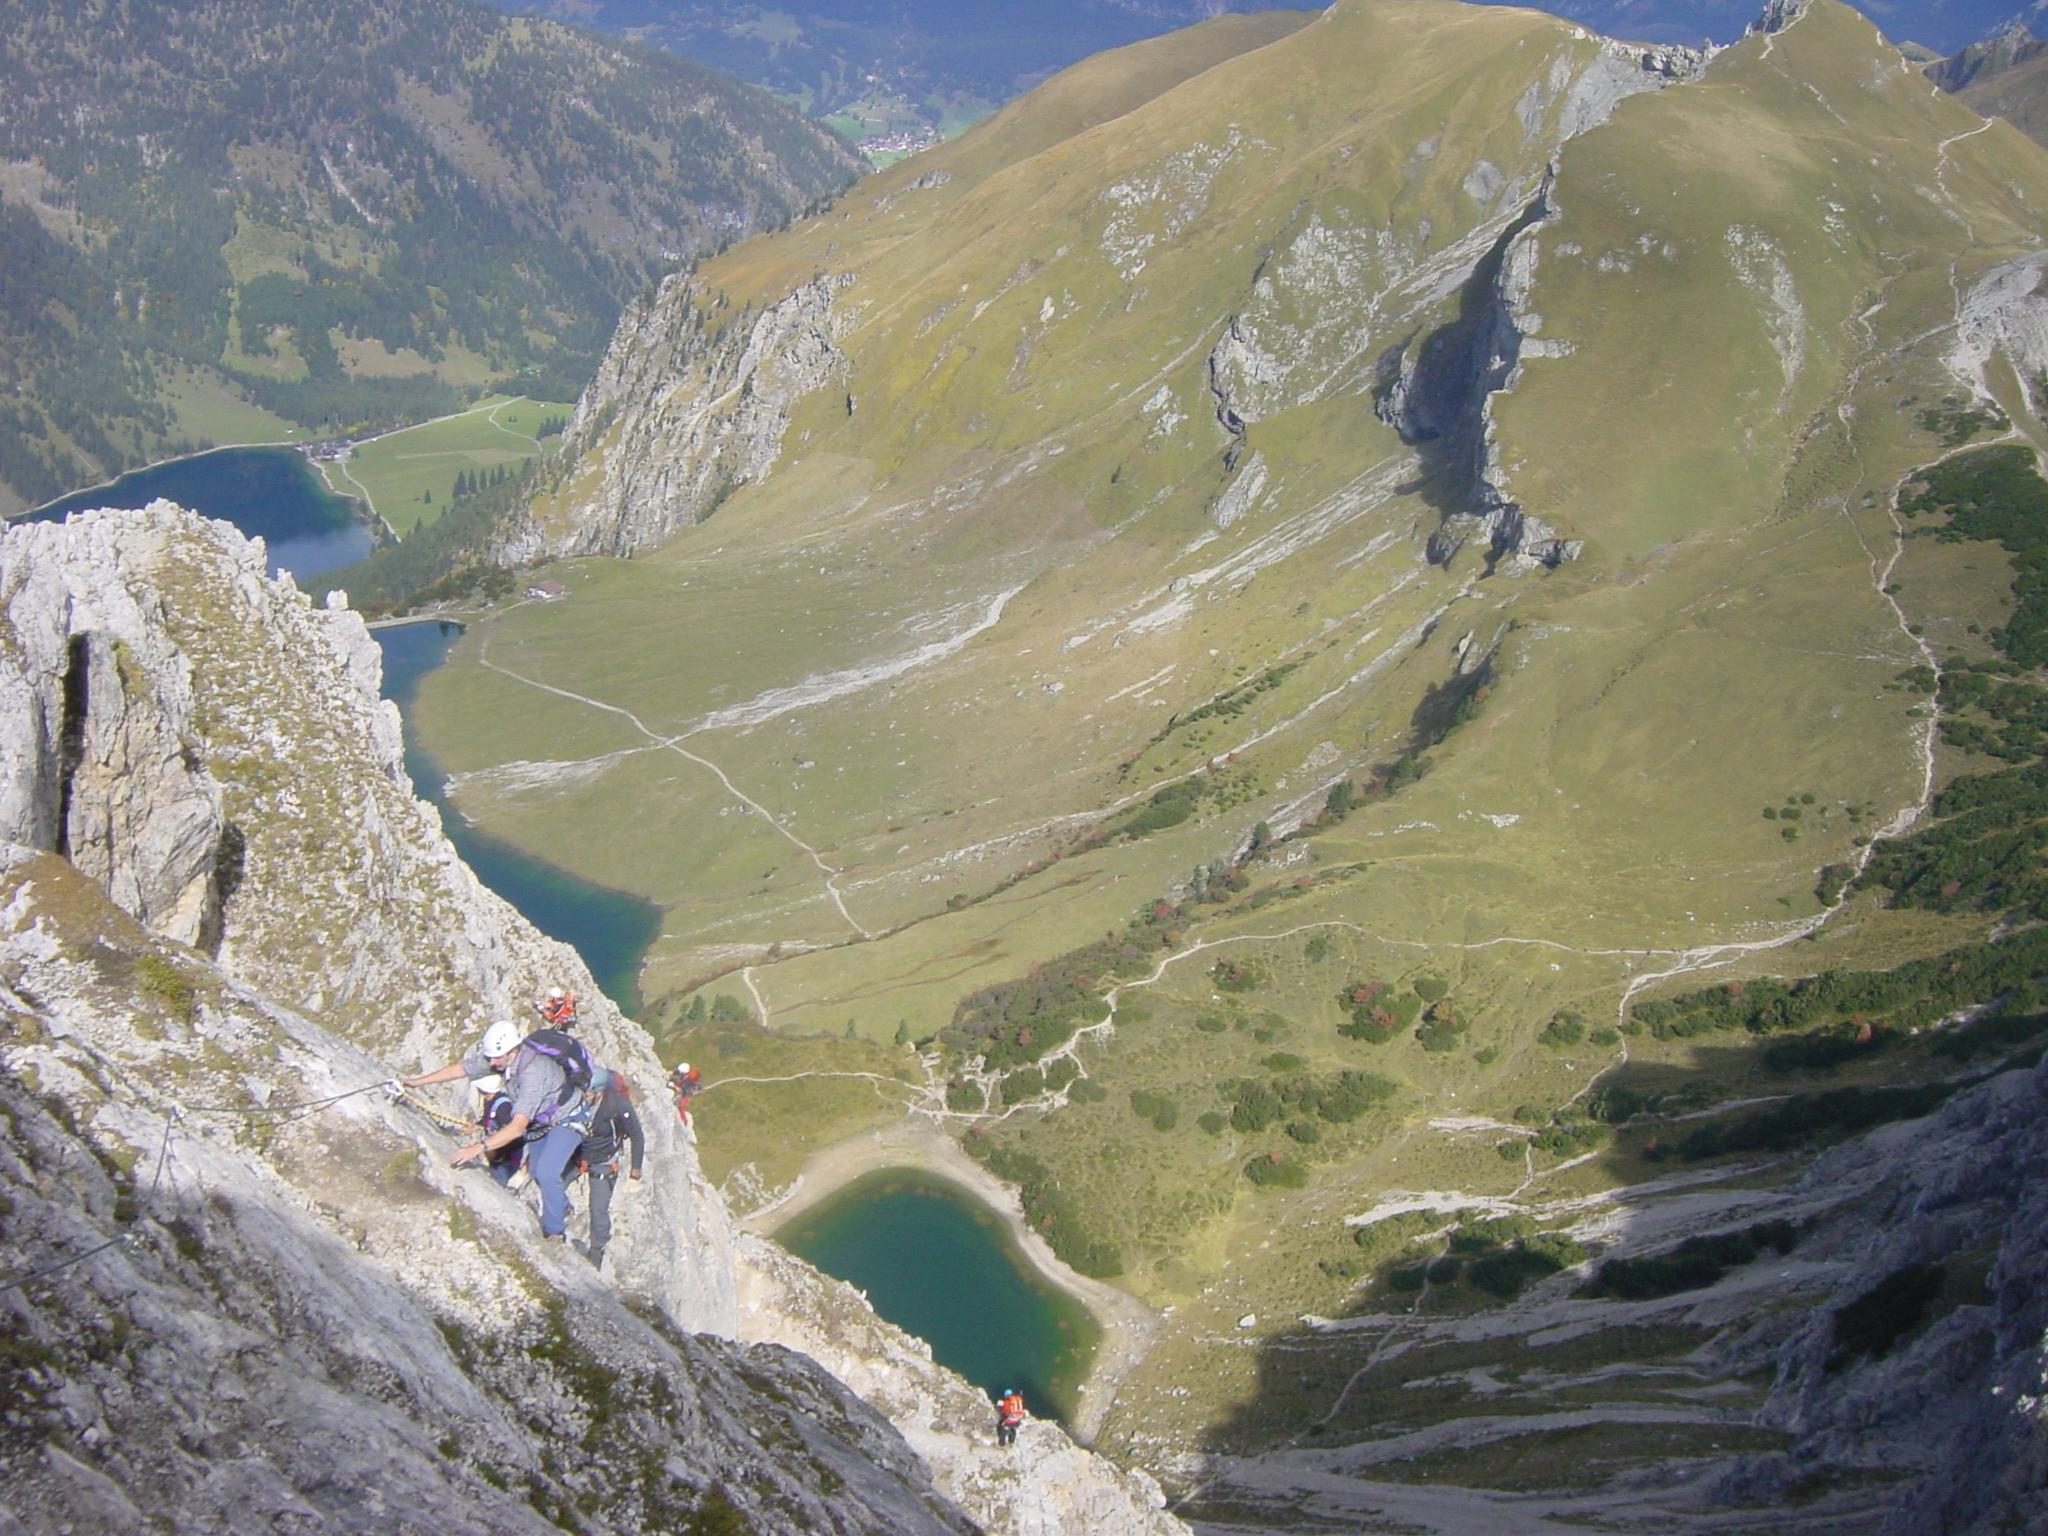 Klettersteig Lachenspitze : File:klettersteig an der lachenspitze.jpg wikimedia commons